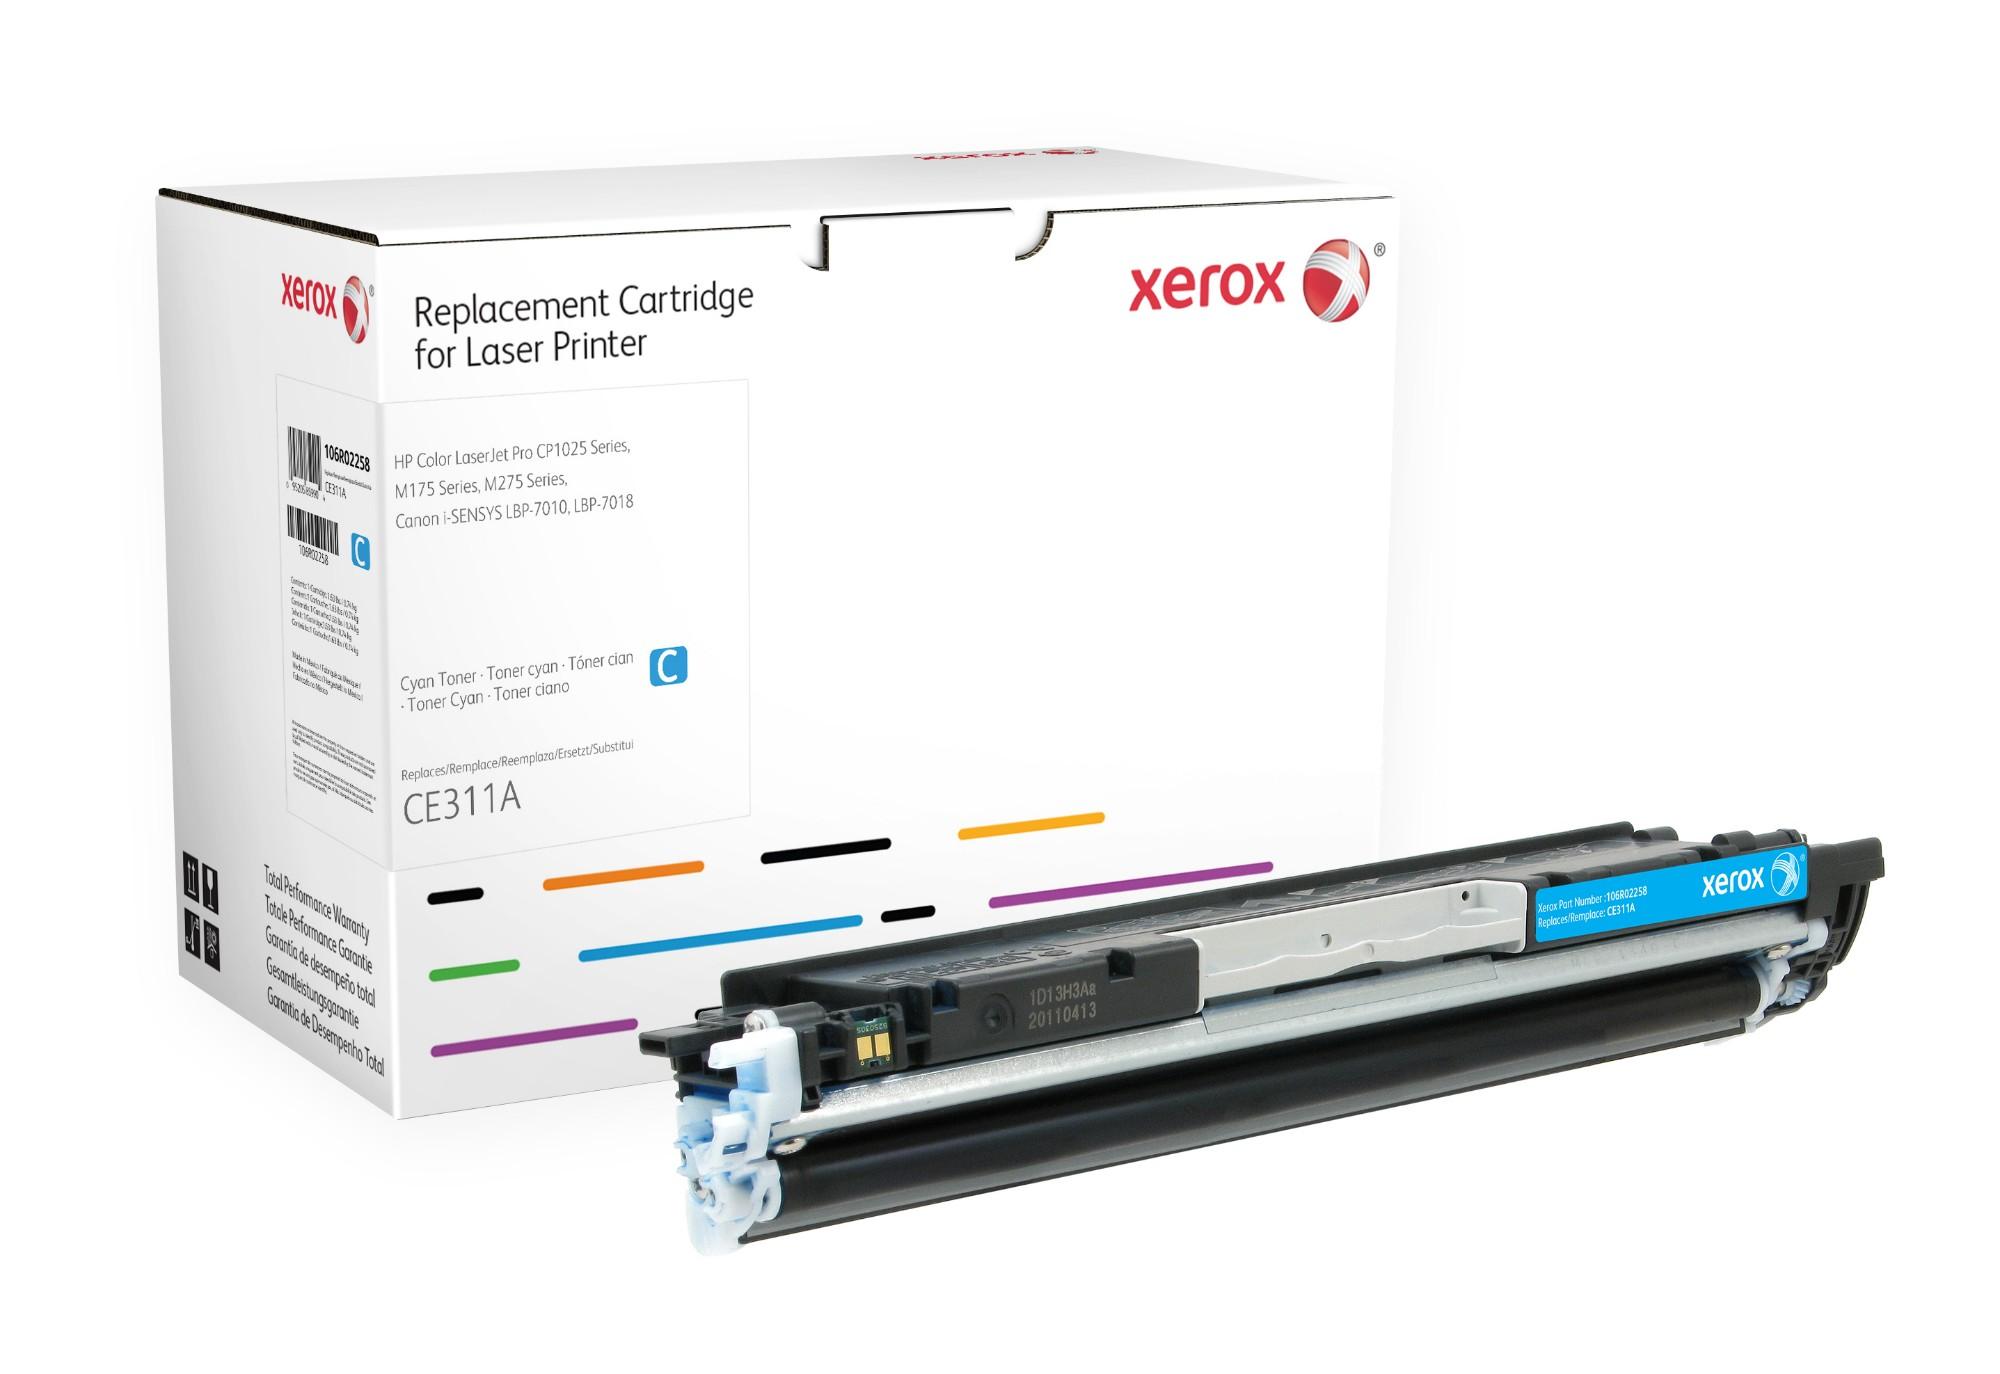 Xerox Cartucho de tóner cian. Equivalente a HP CE311A. Compatible con HP Colour LaserJet 100 M175 MFP, Colour LaserJet CP1025